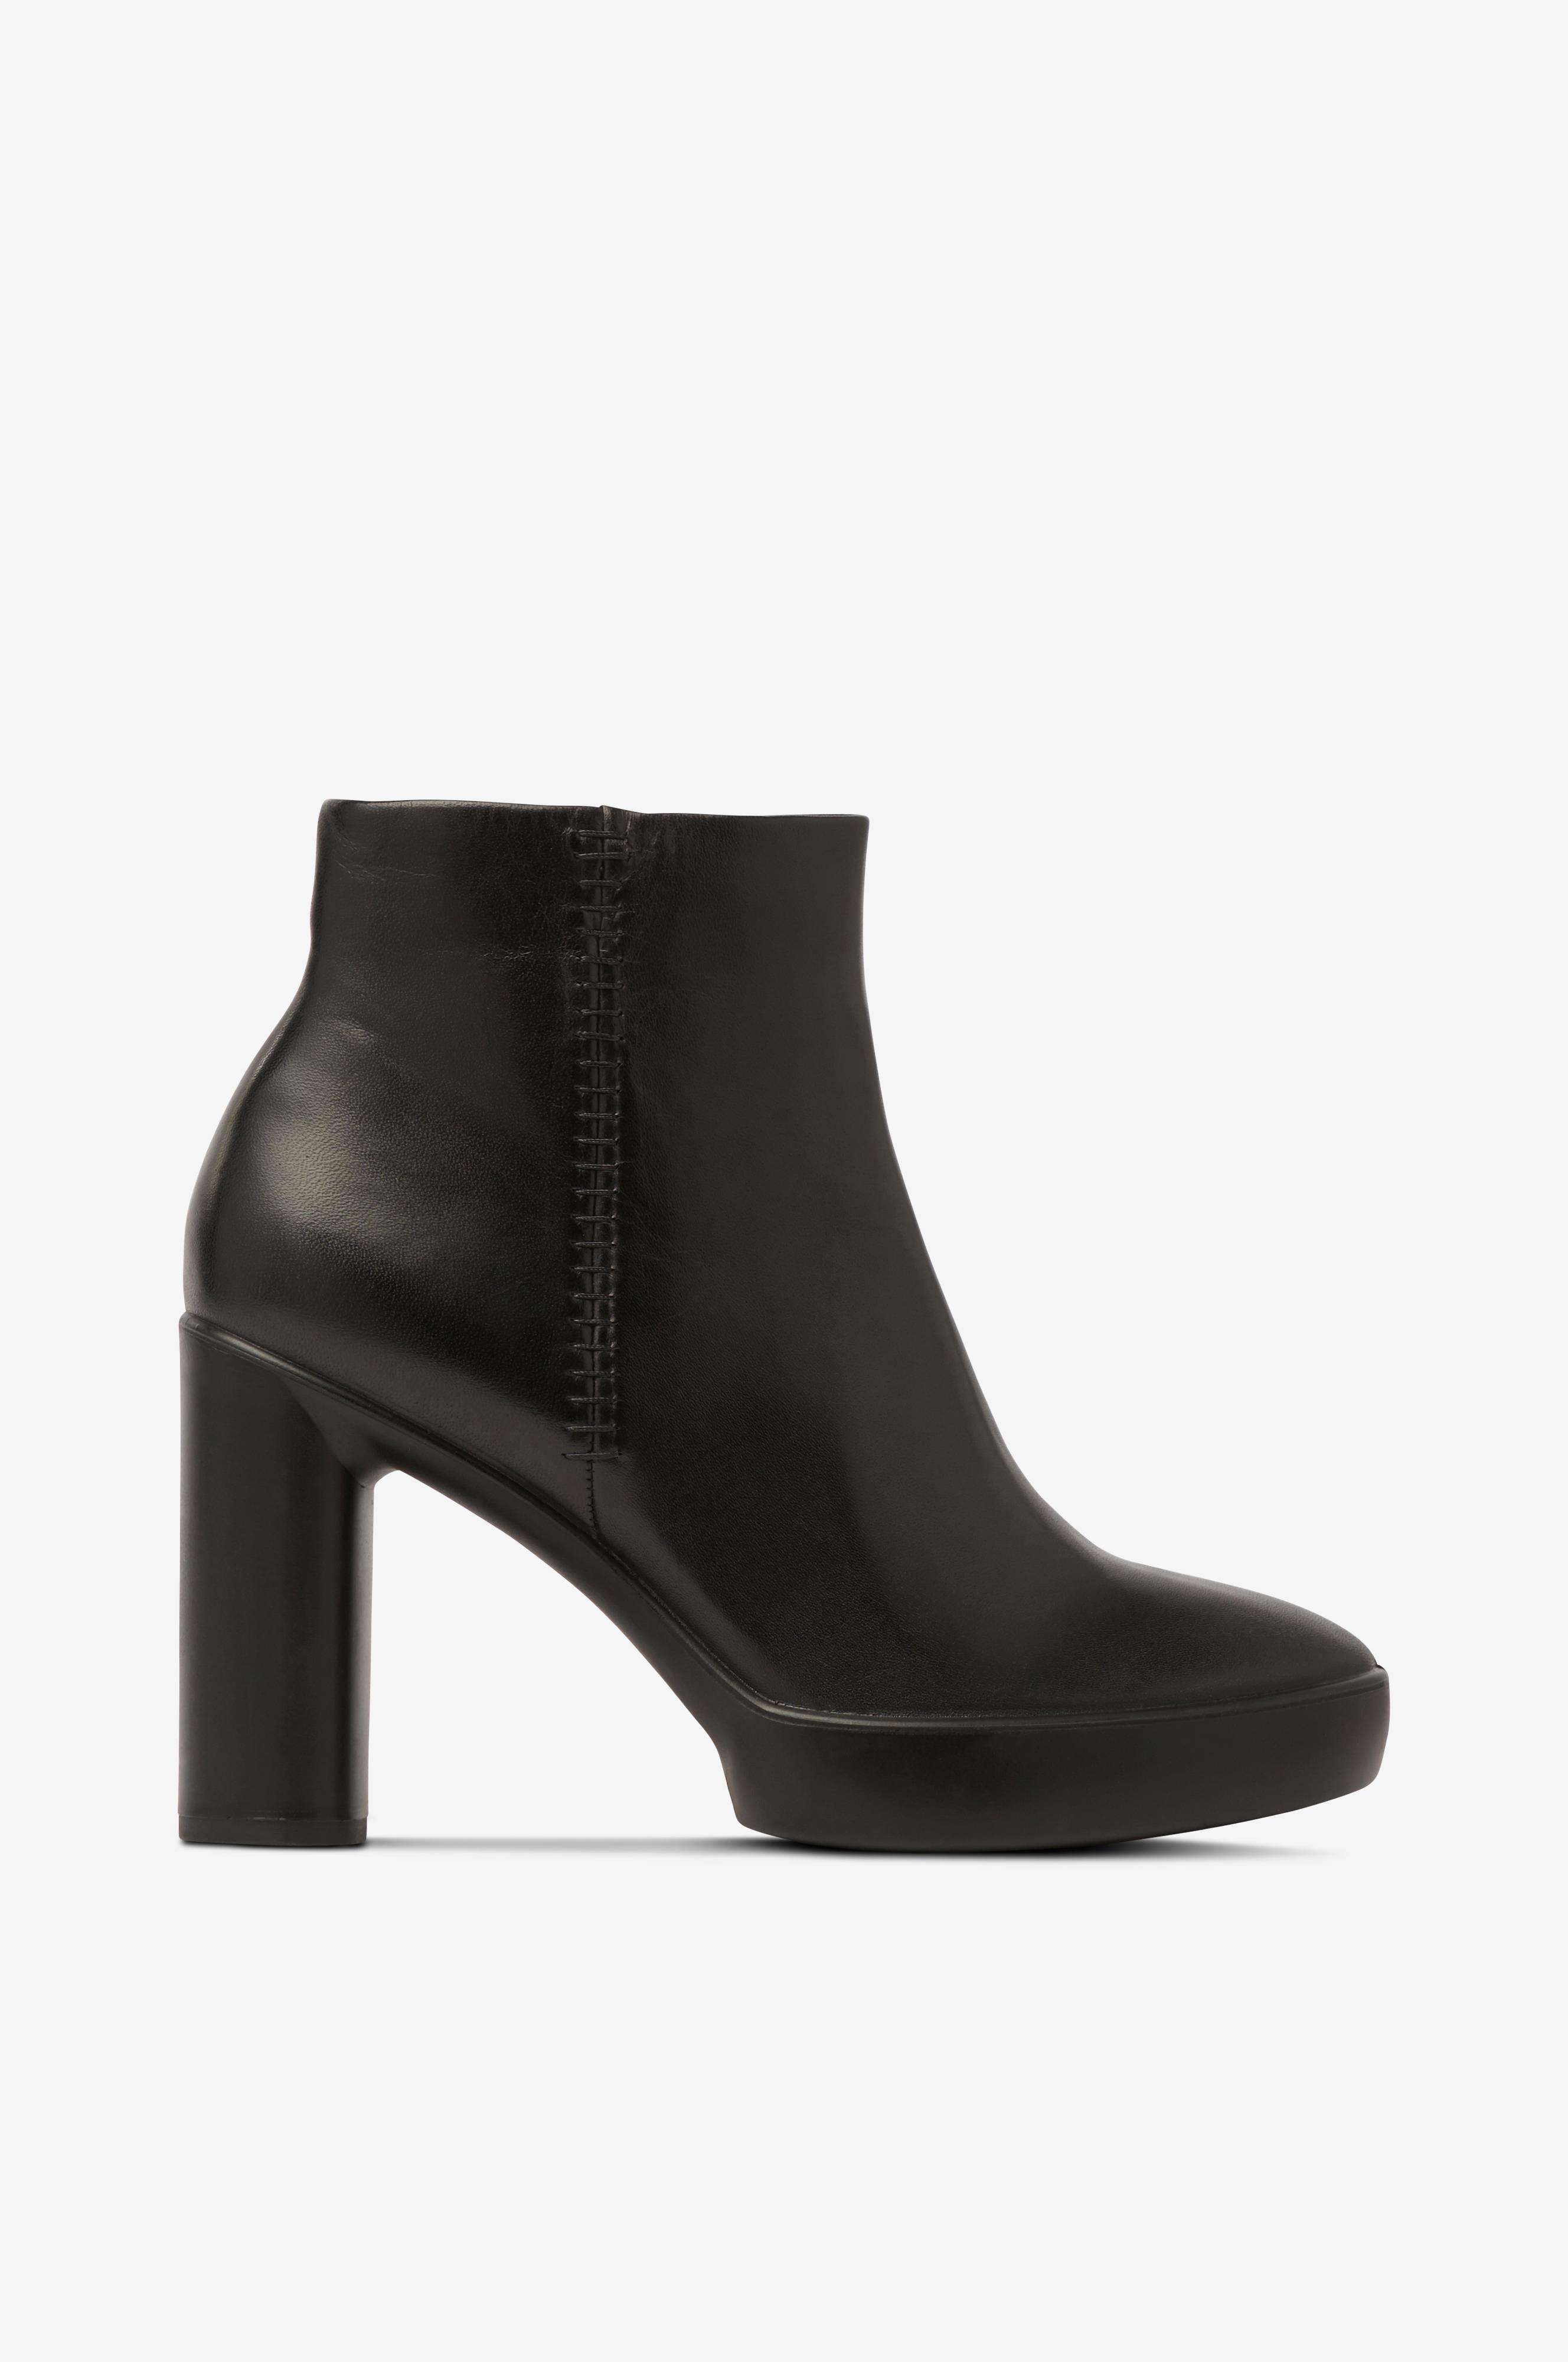 ecco Boots Shape Sculpted Motion 75 Hvid Dame Ellos.dk